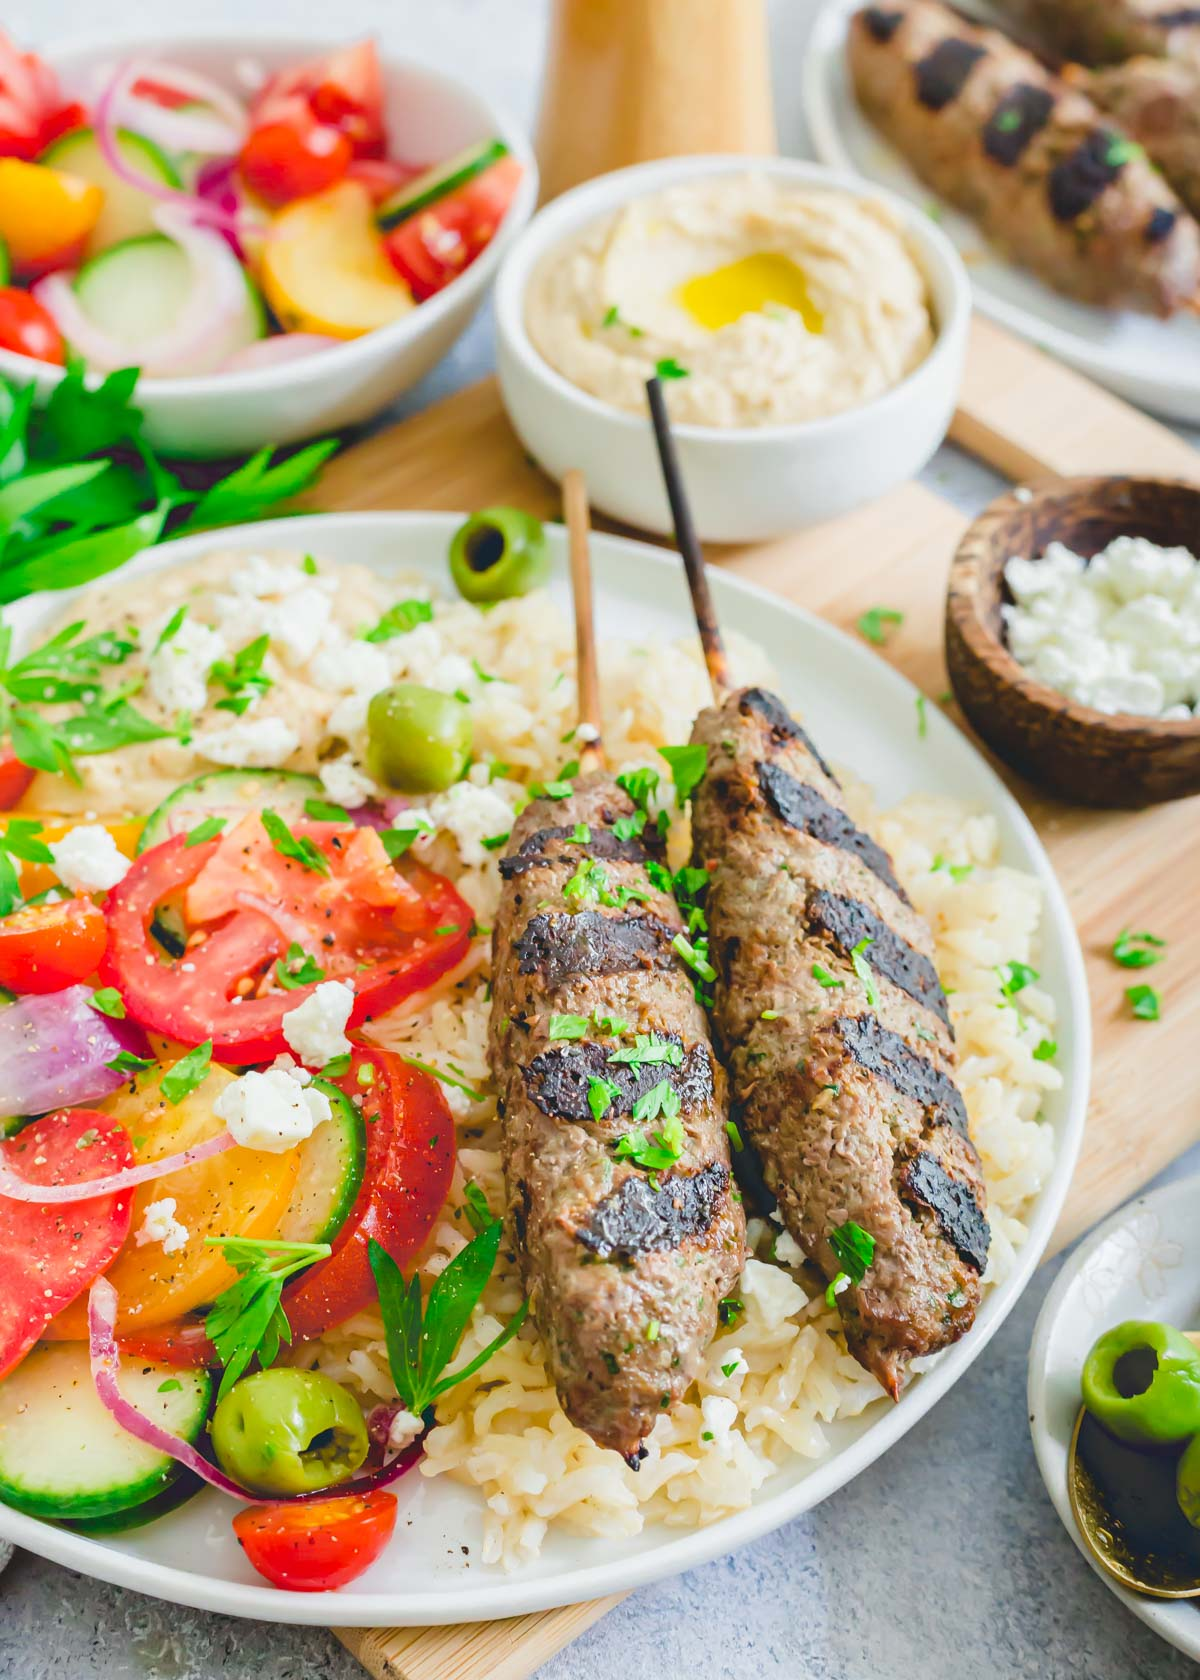 Beef kafta recipe served on kabobs with rice, tomato cucumber salad, hummus and feta.